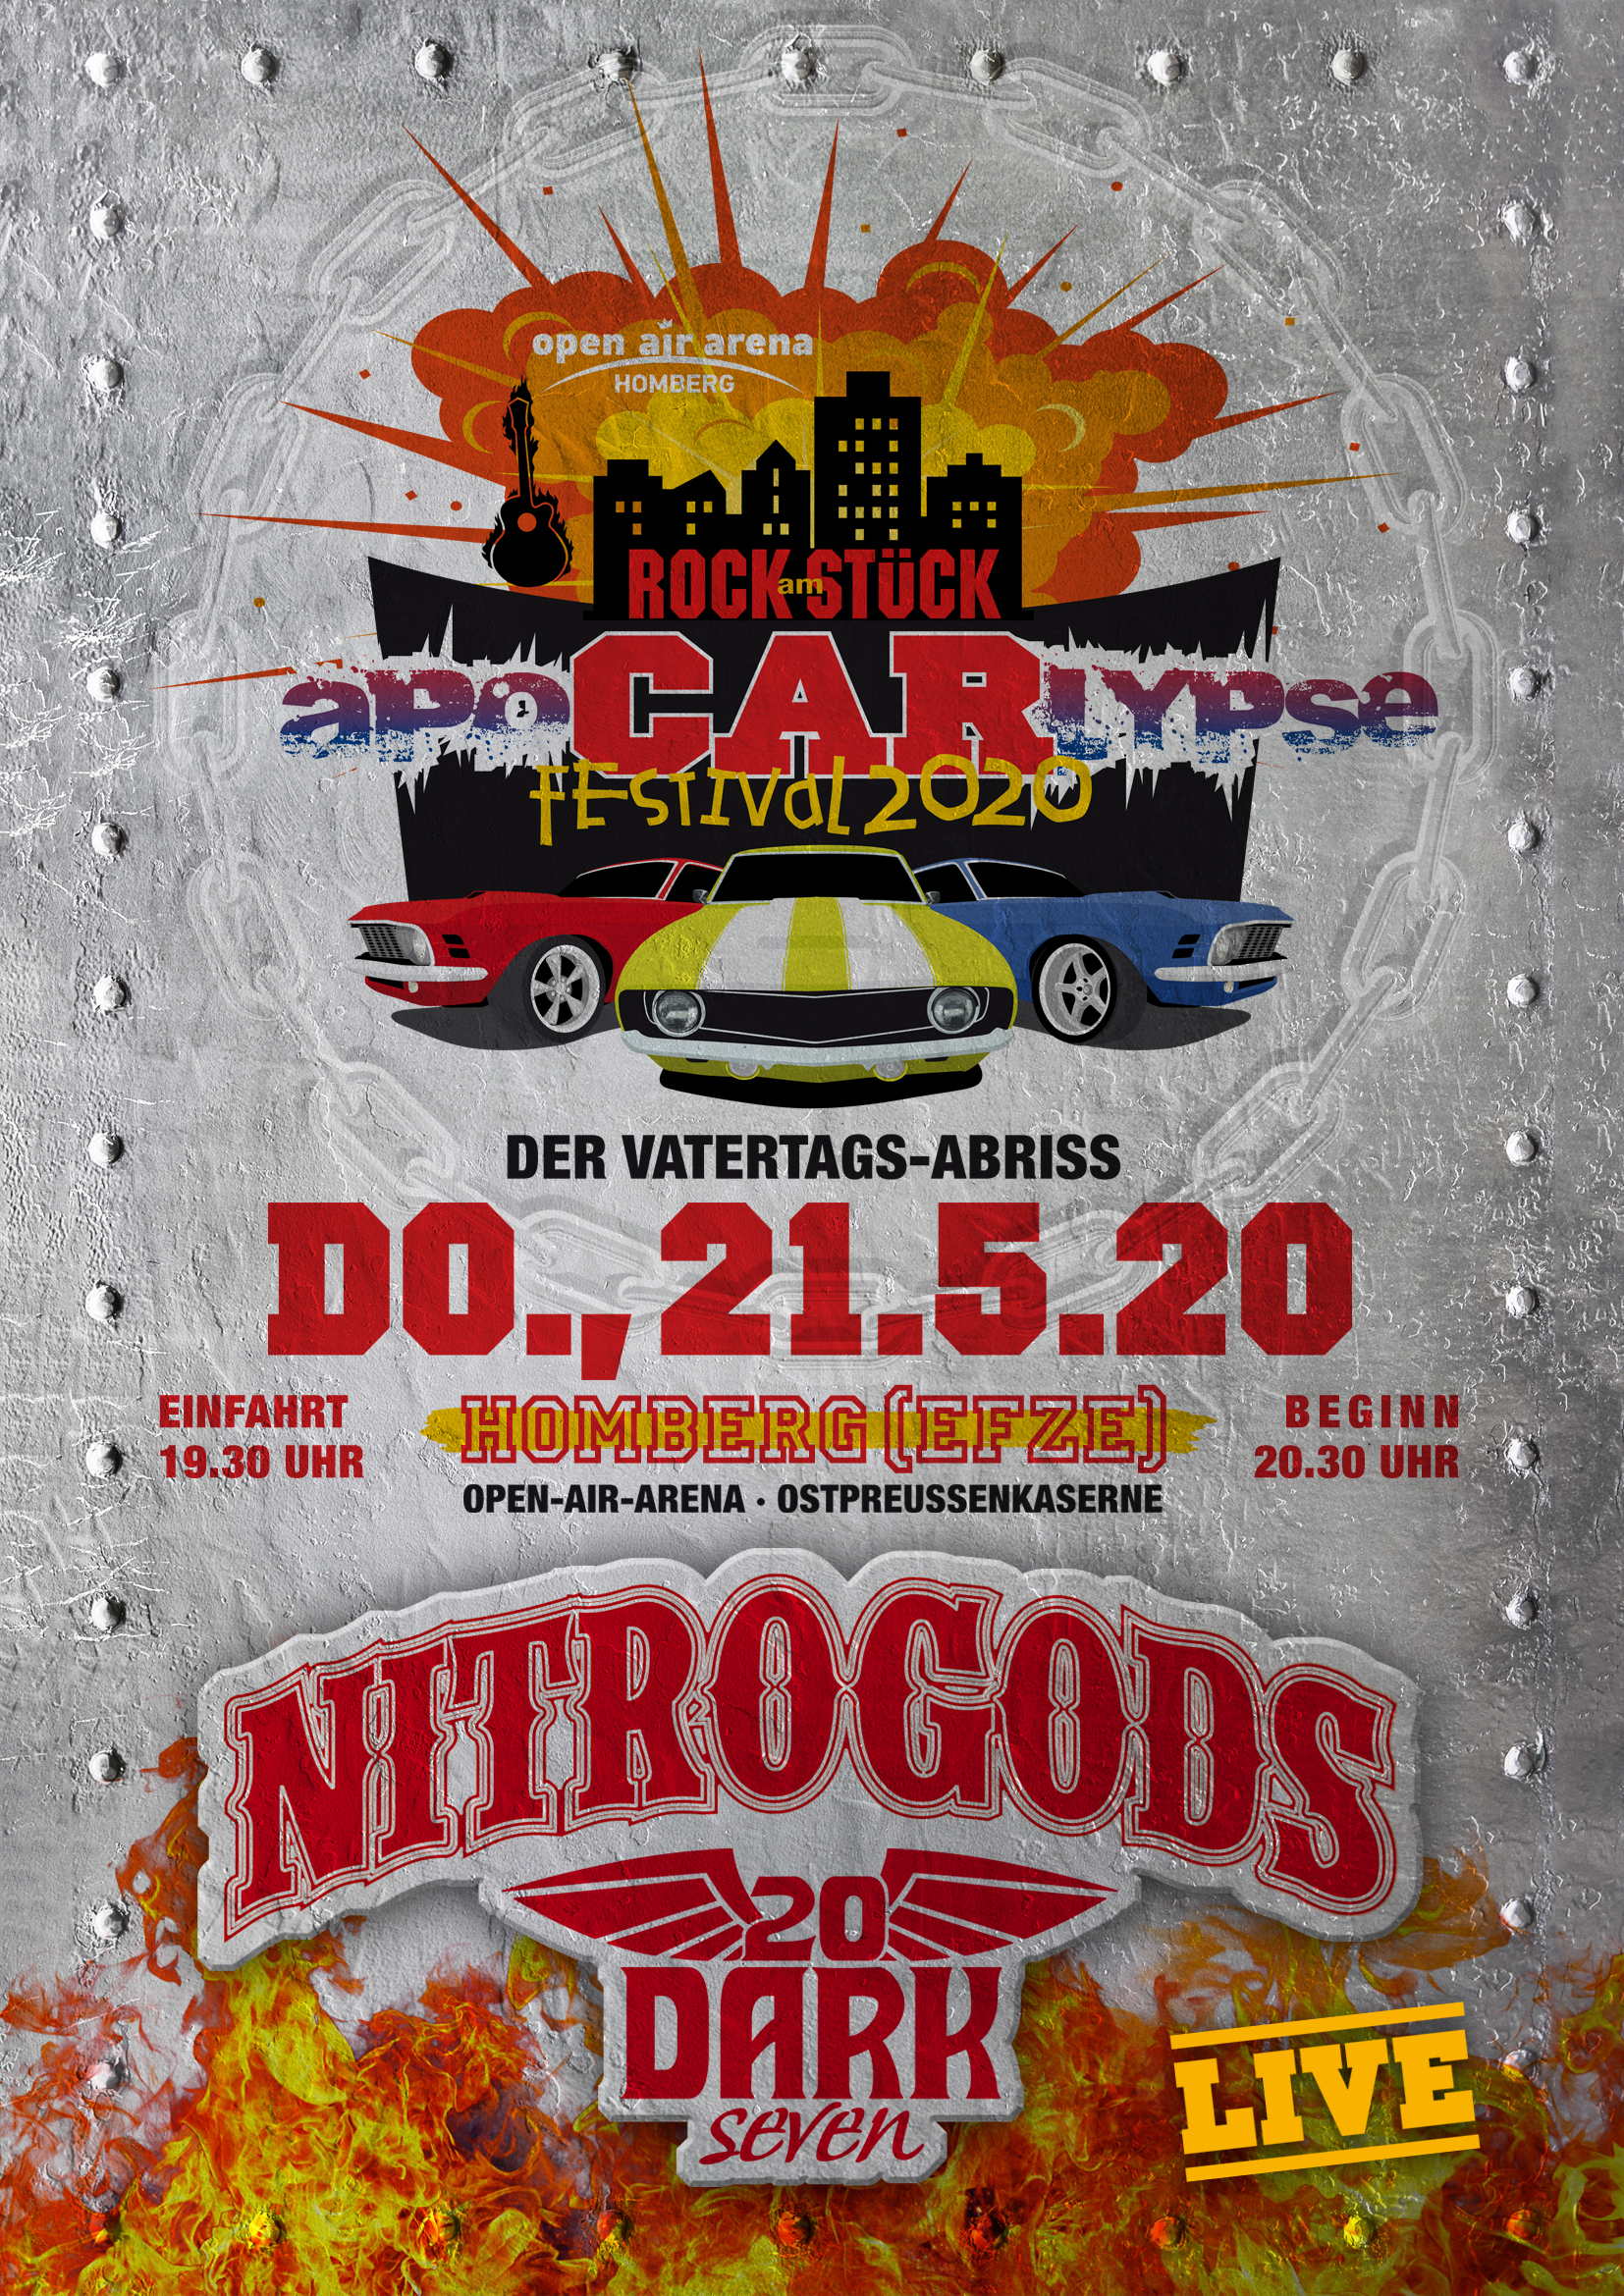 anschnallen-hessen-rockt-im-auto-rock-metal-live-auf-dem-autokino-festival-in-homberg-efze